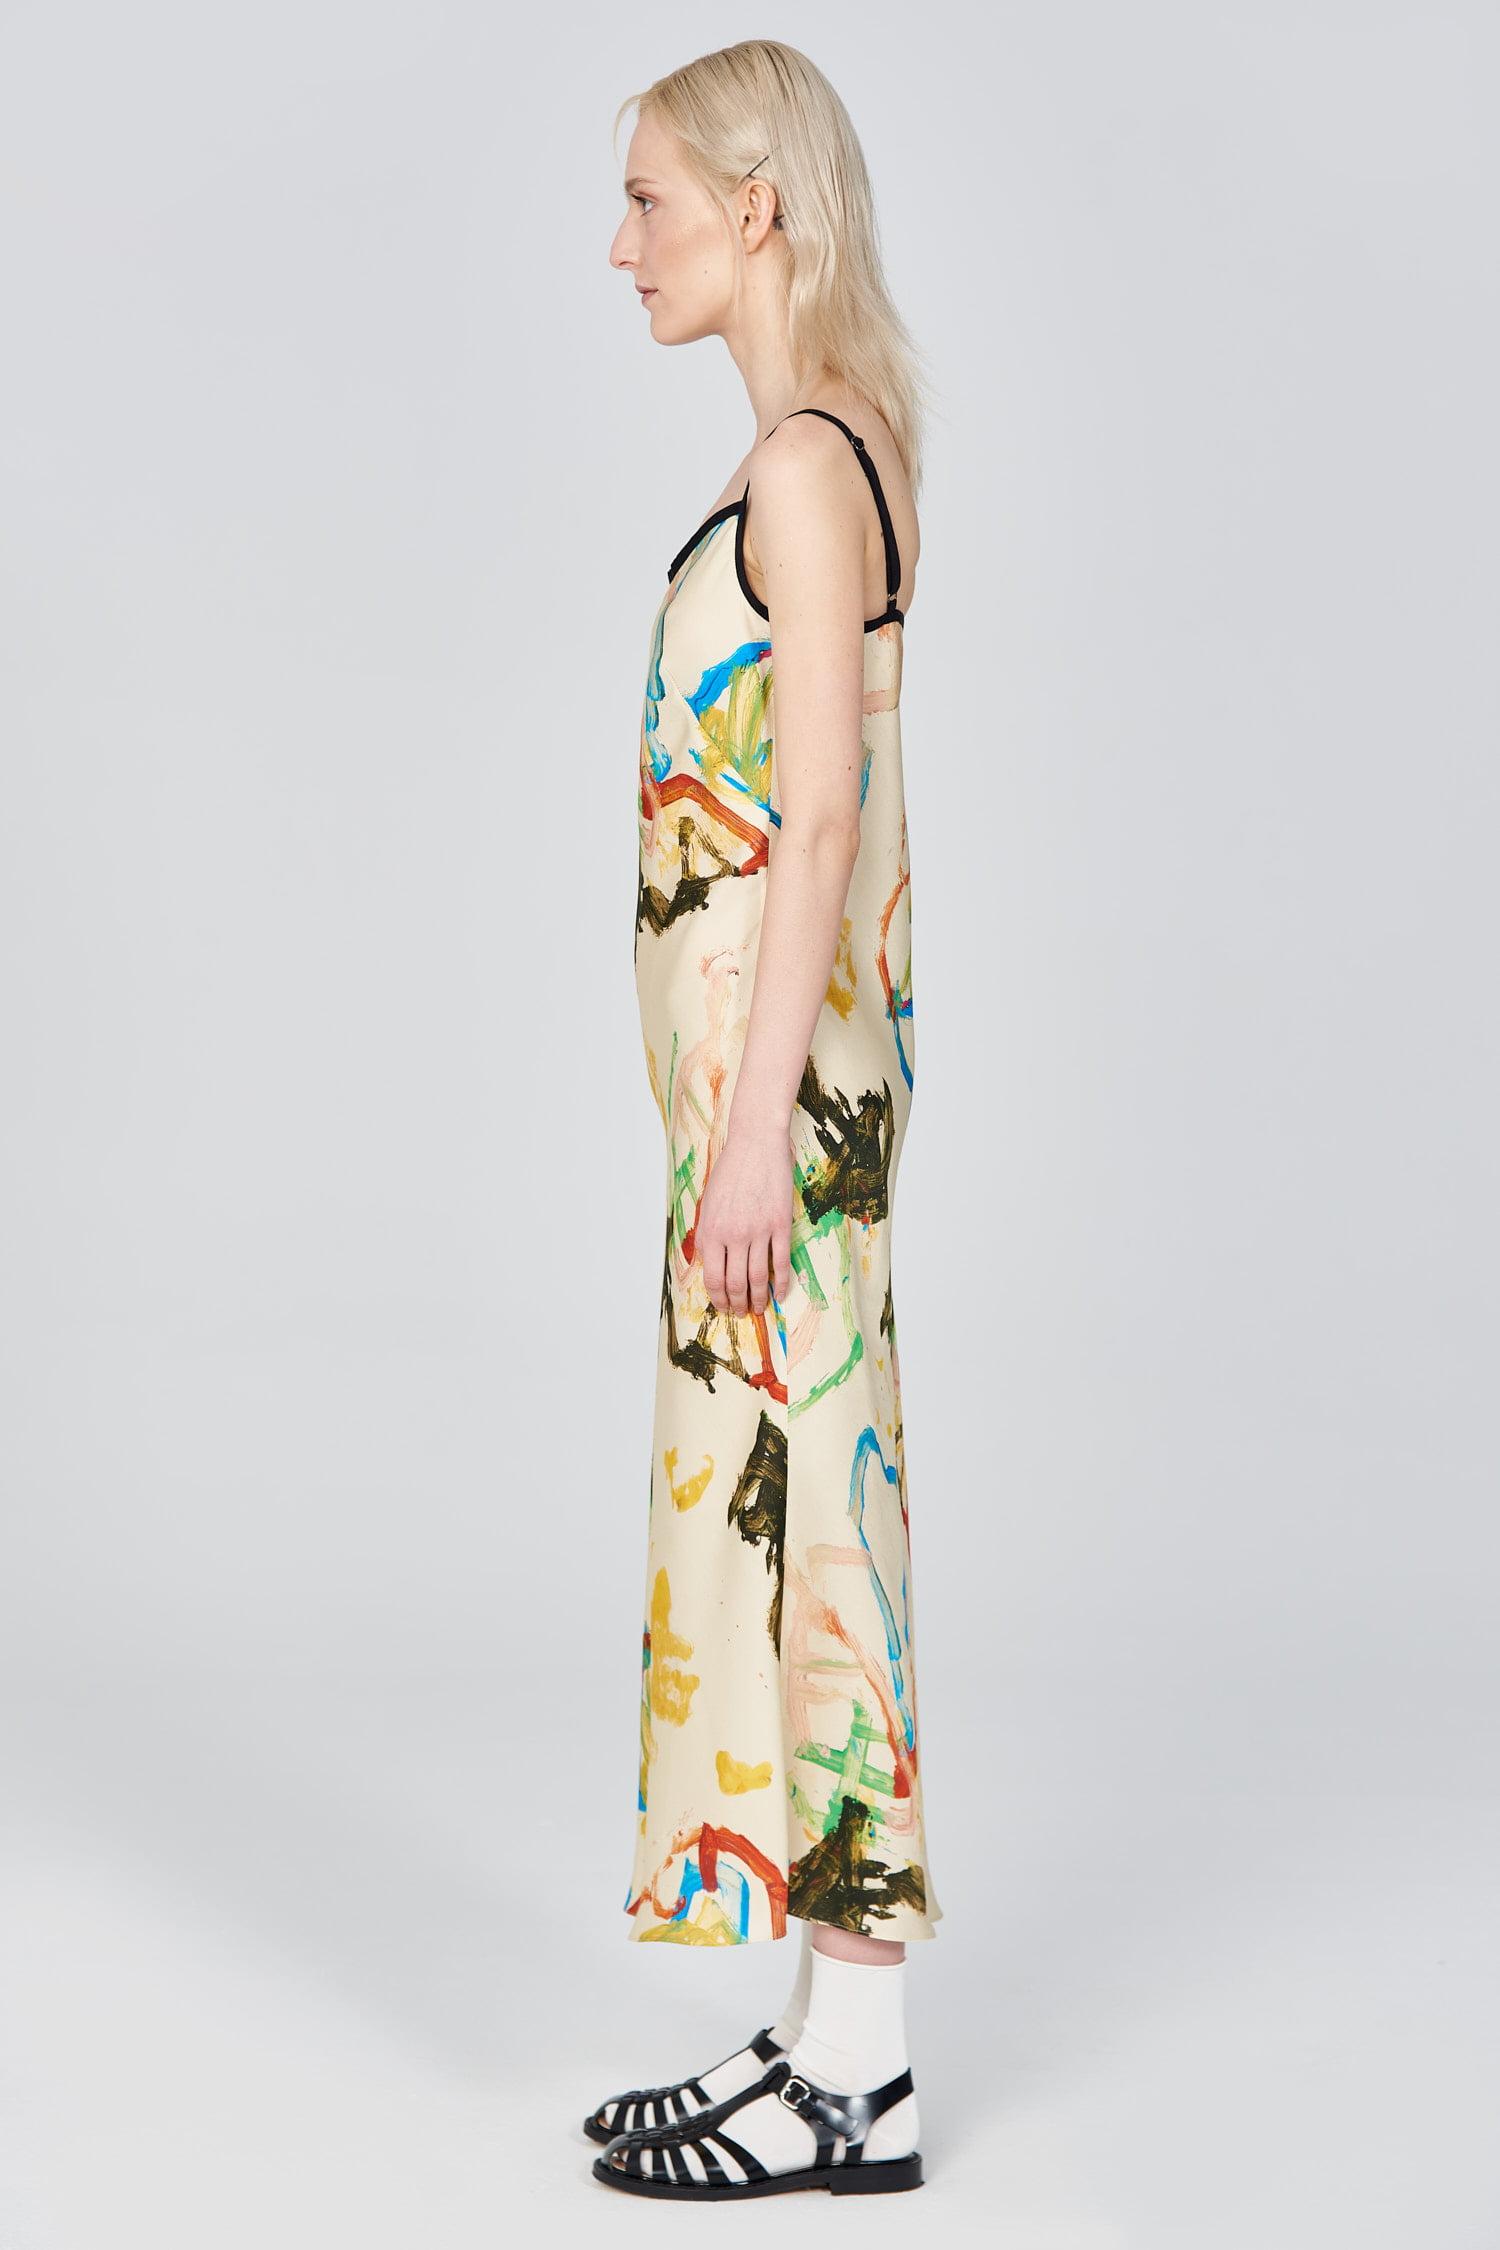 Acephala Ss21 Printed Slip Dress Side